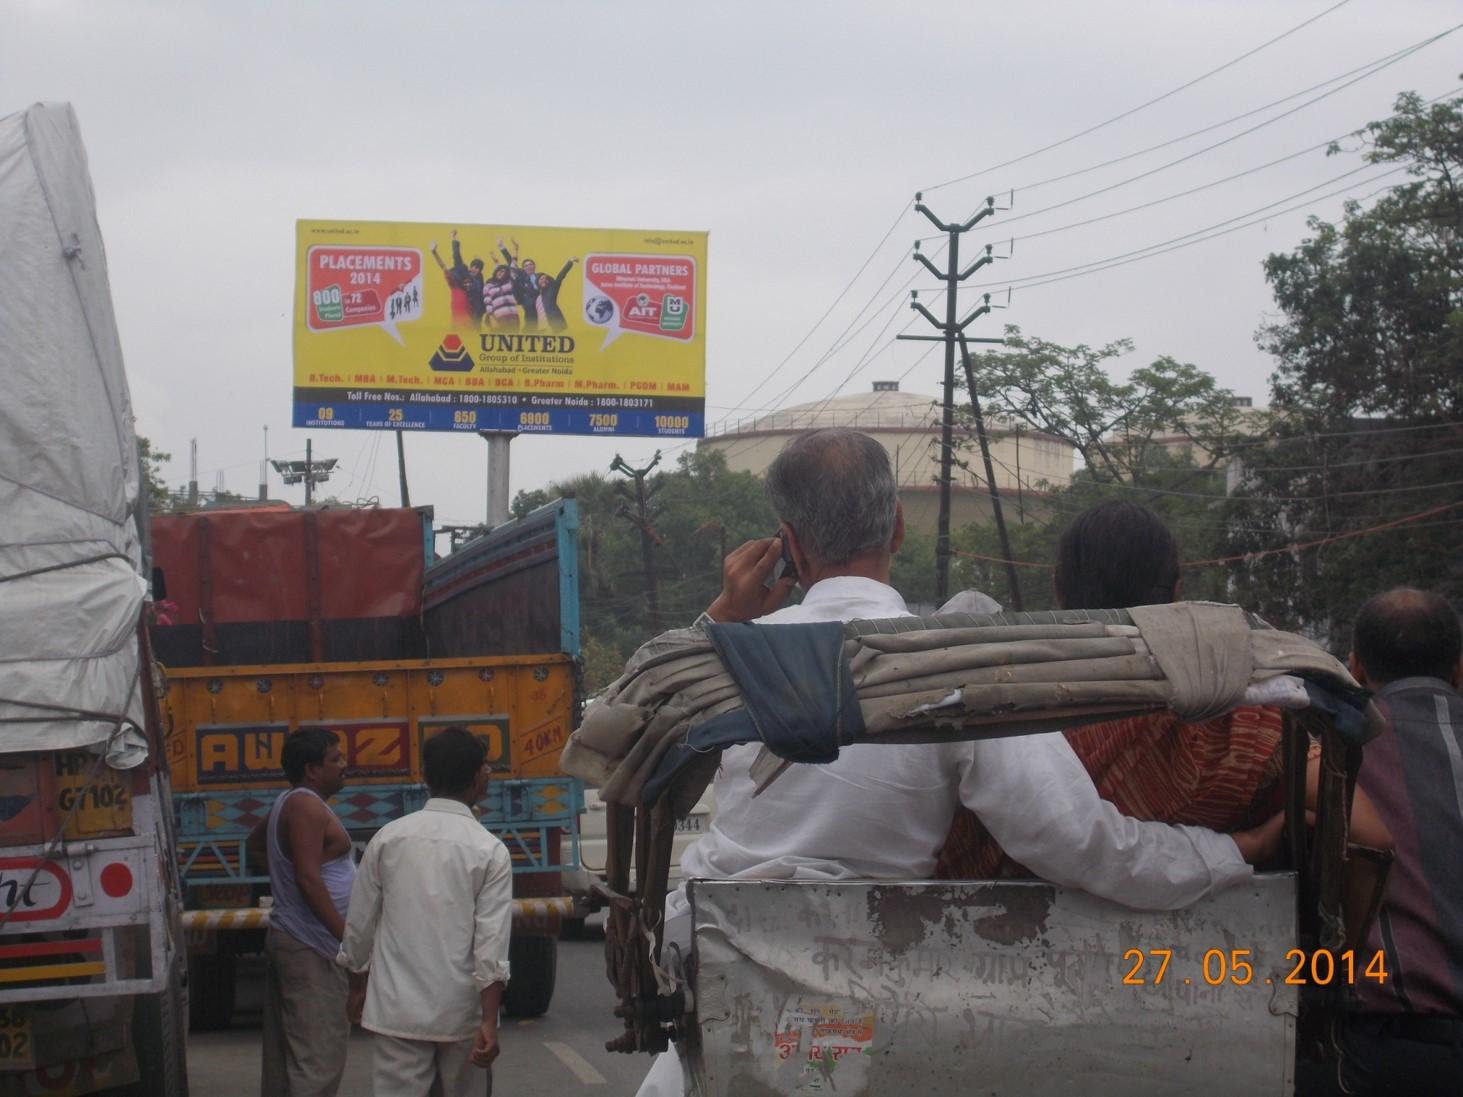 VARANASI CITY RAILWAY STATION, Varanasi